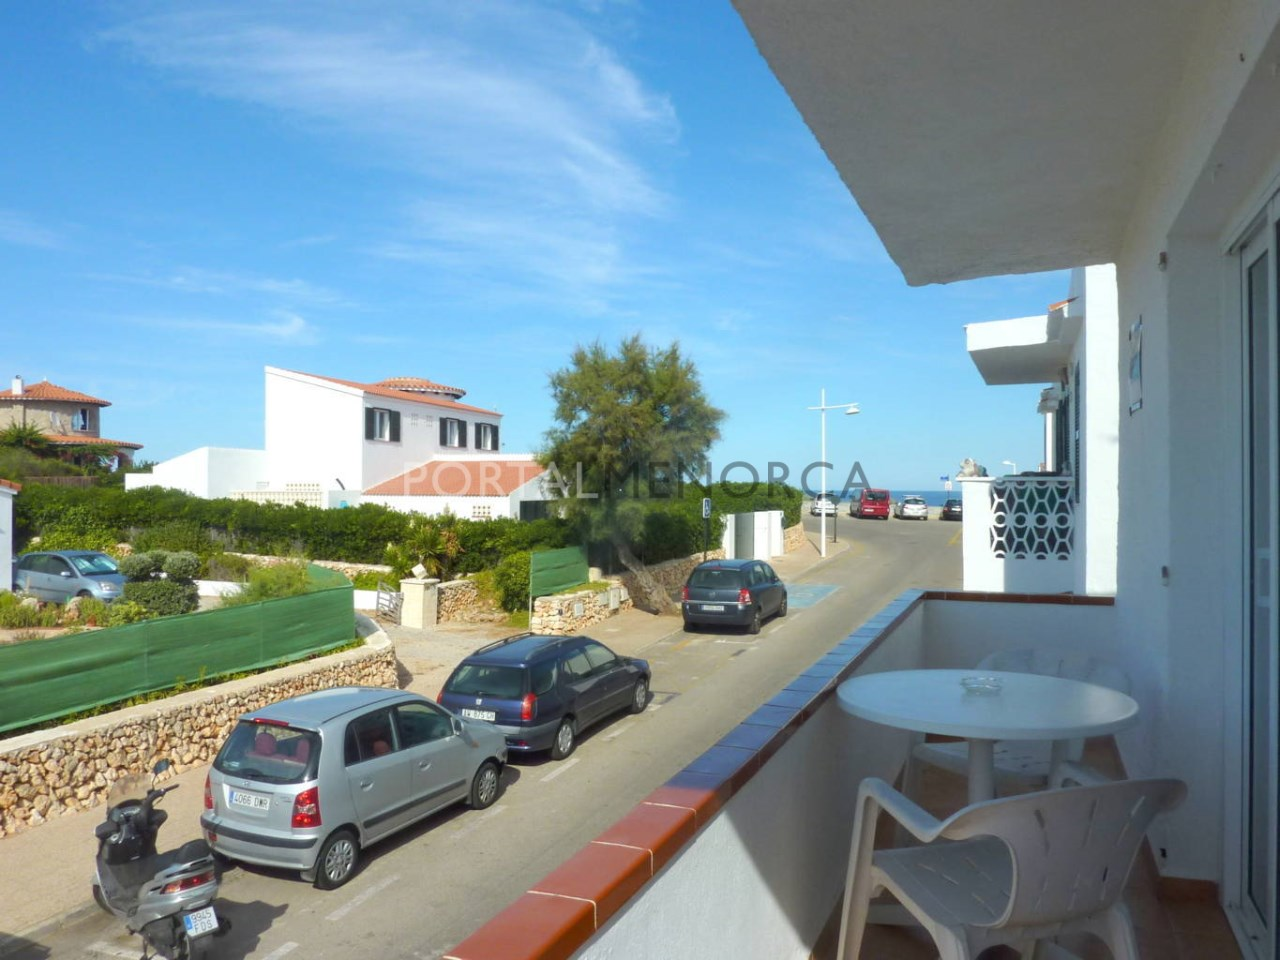 Flatt for sale in S'Algar, Menorca with sea view and balcony